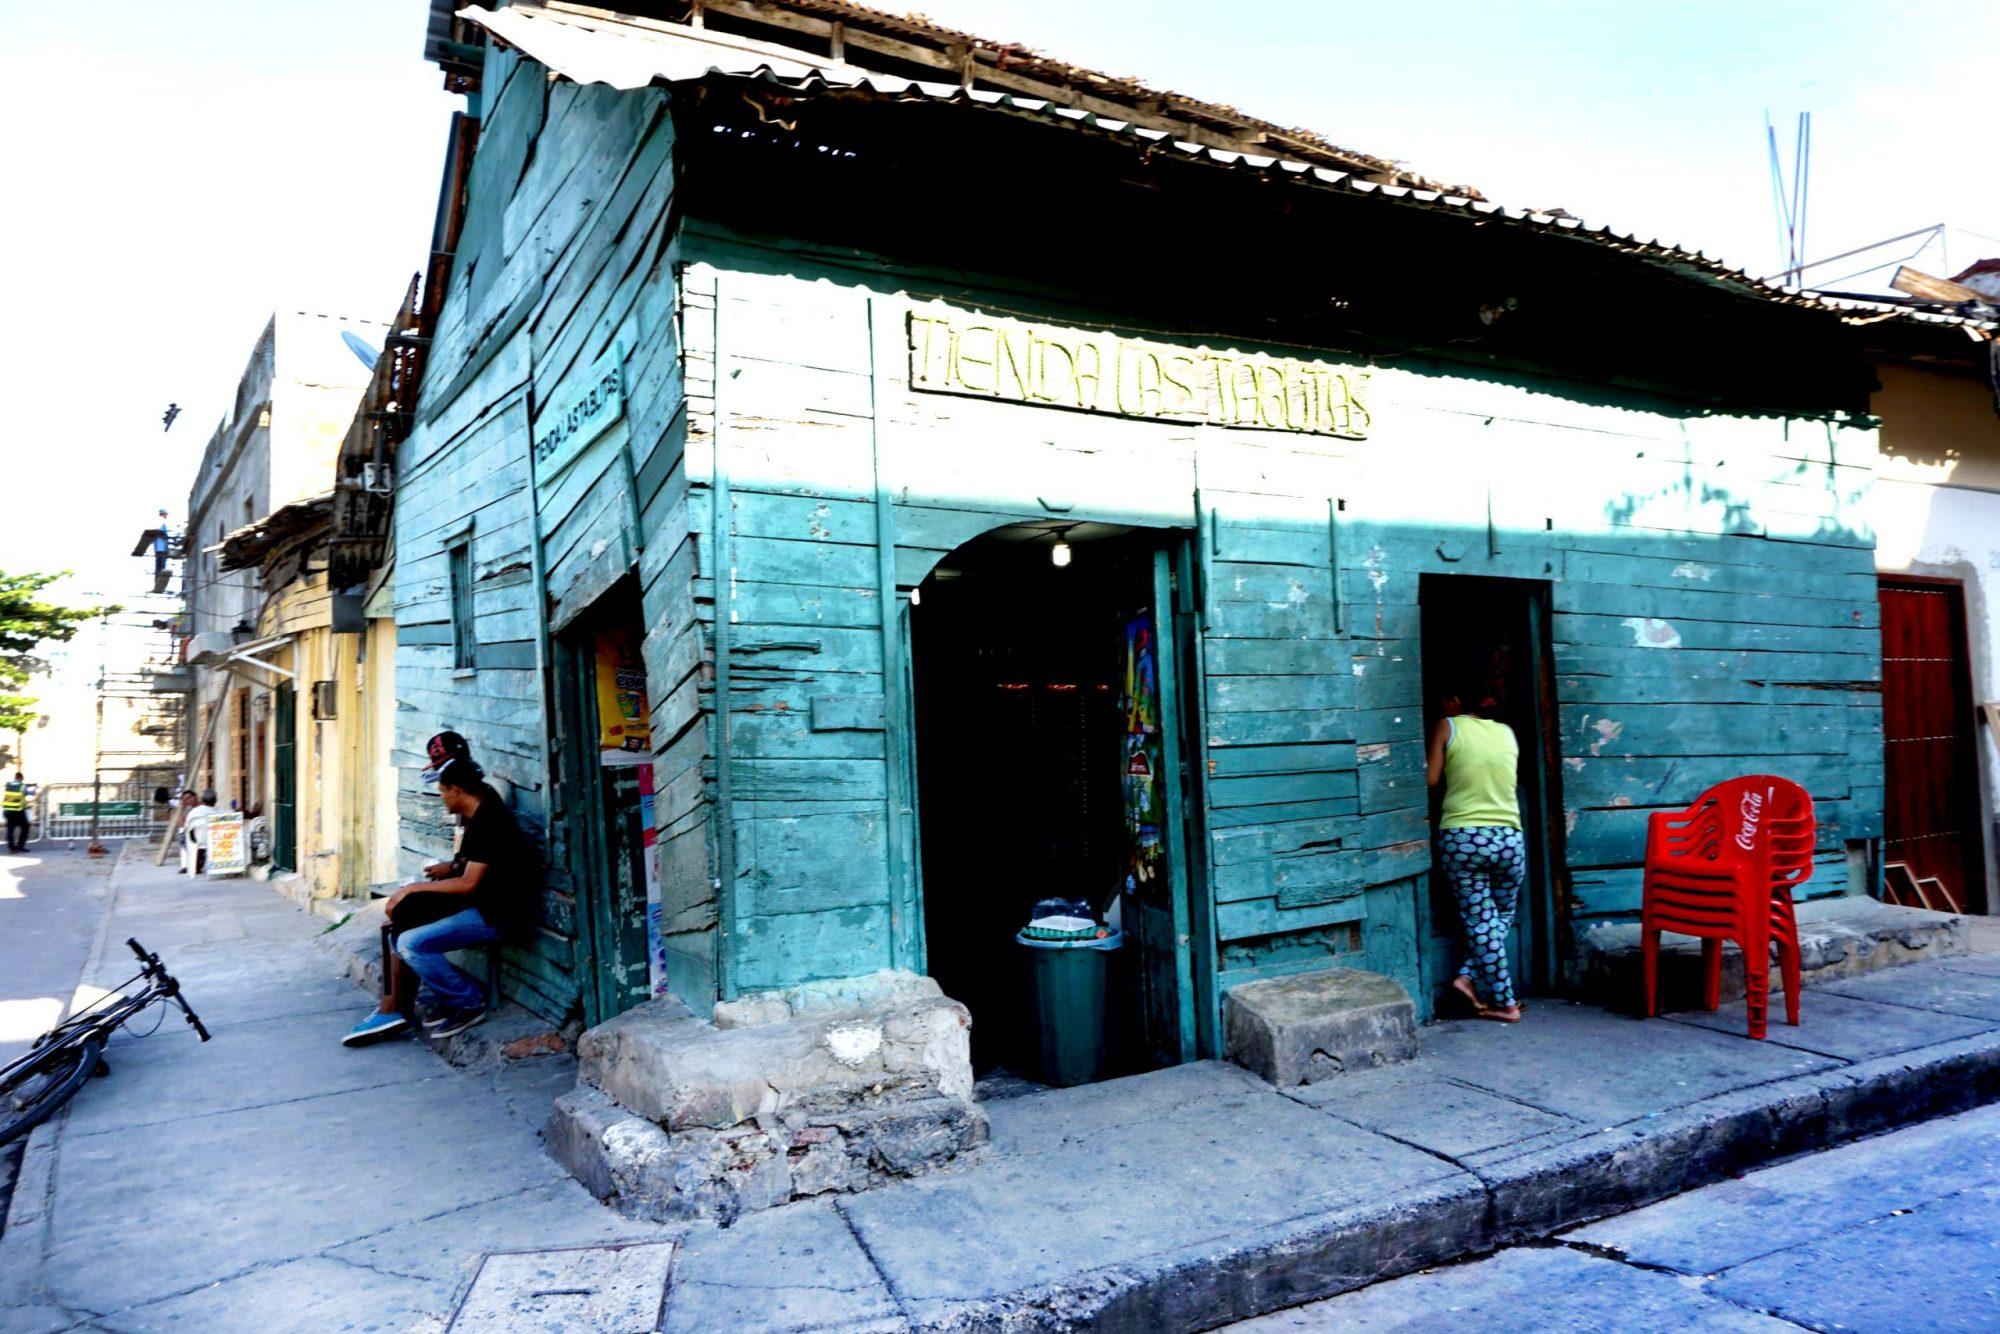 Getsemani Shops